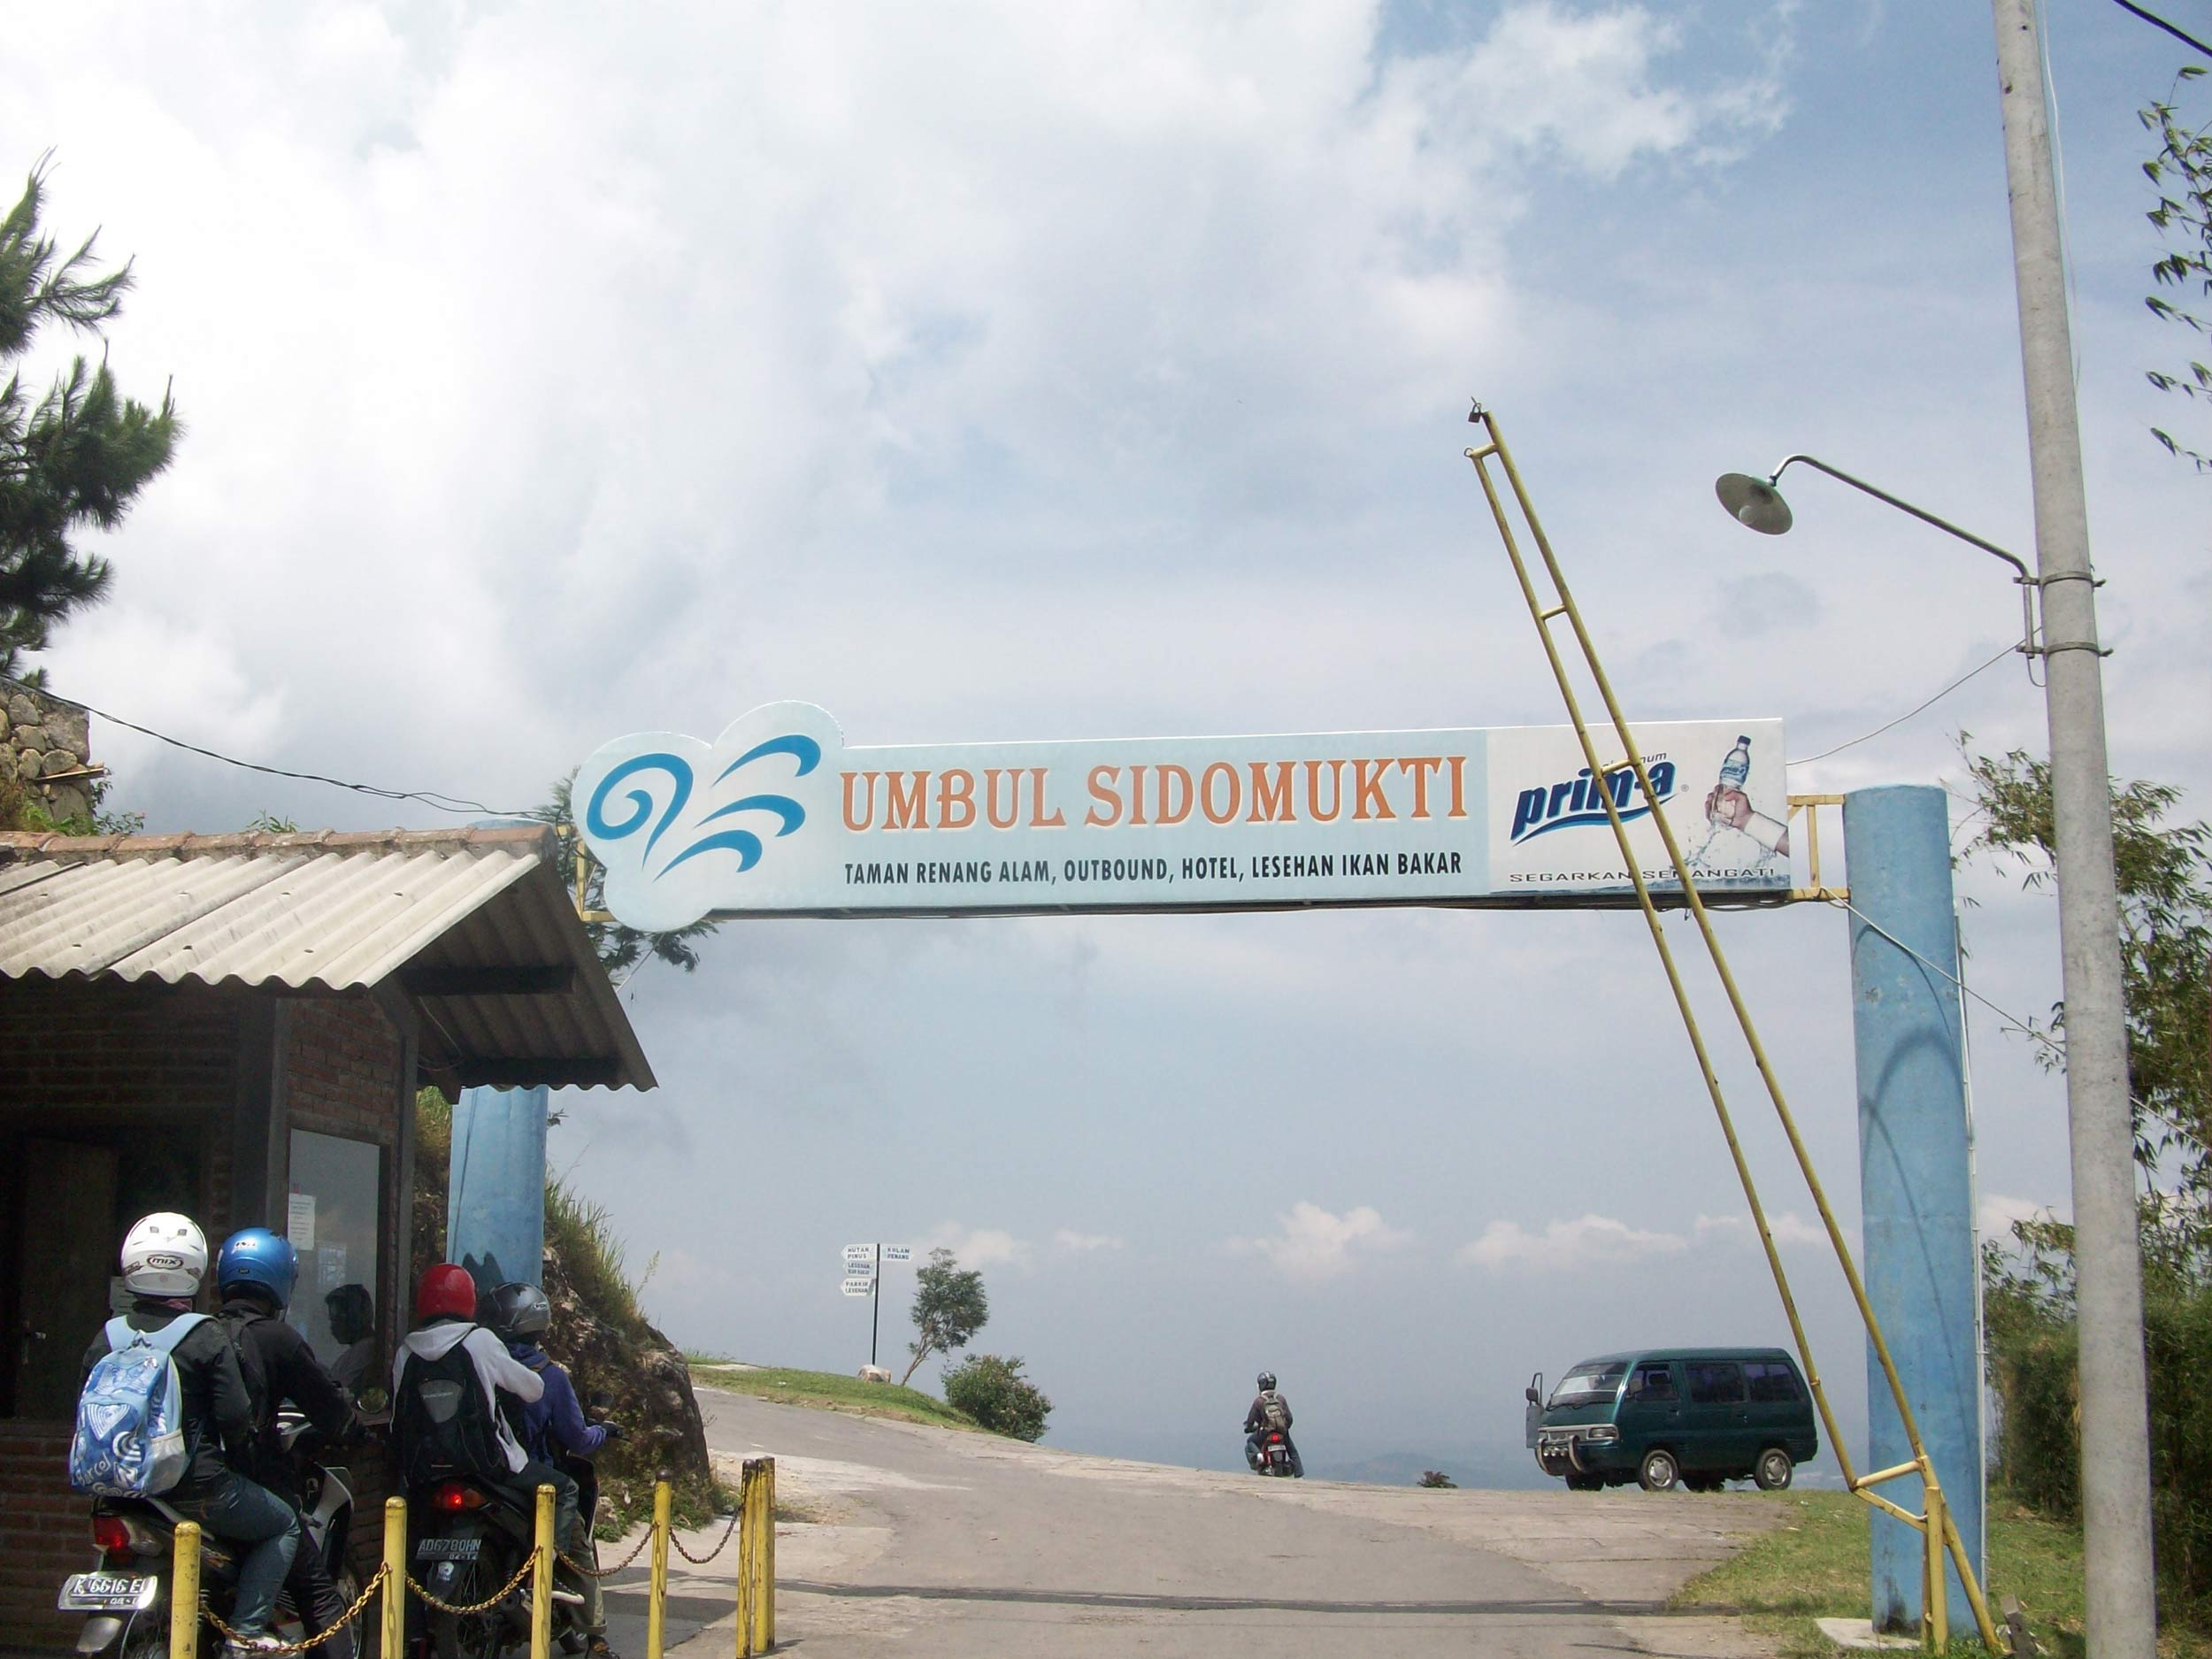 Umbul Sidomukti Ungaran Semarang Dolandolanwae